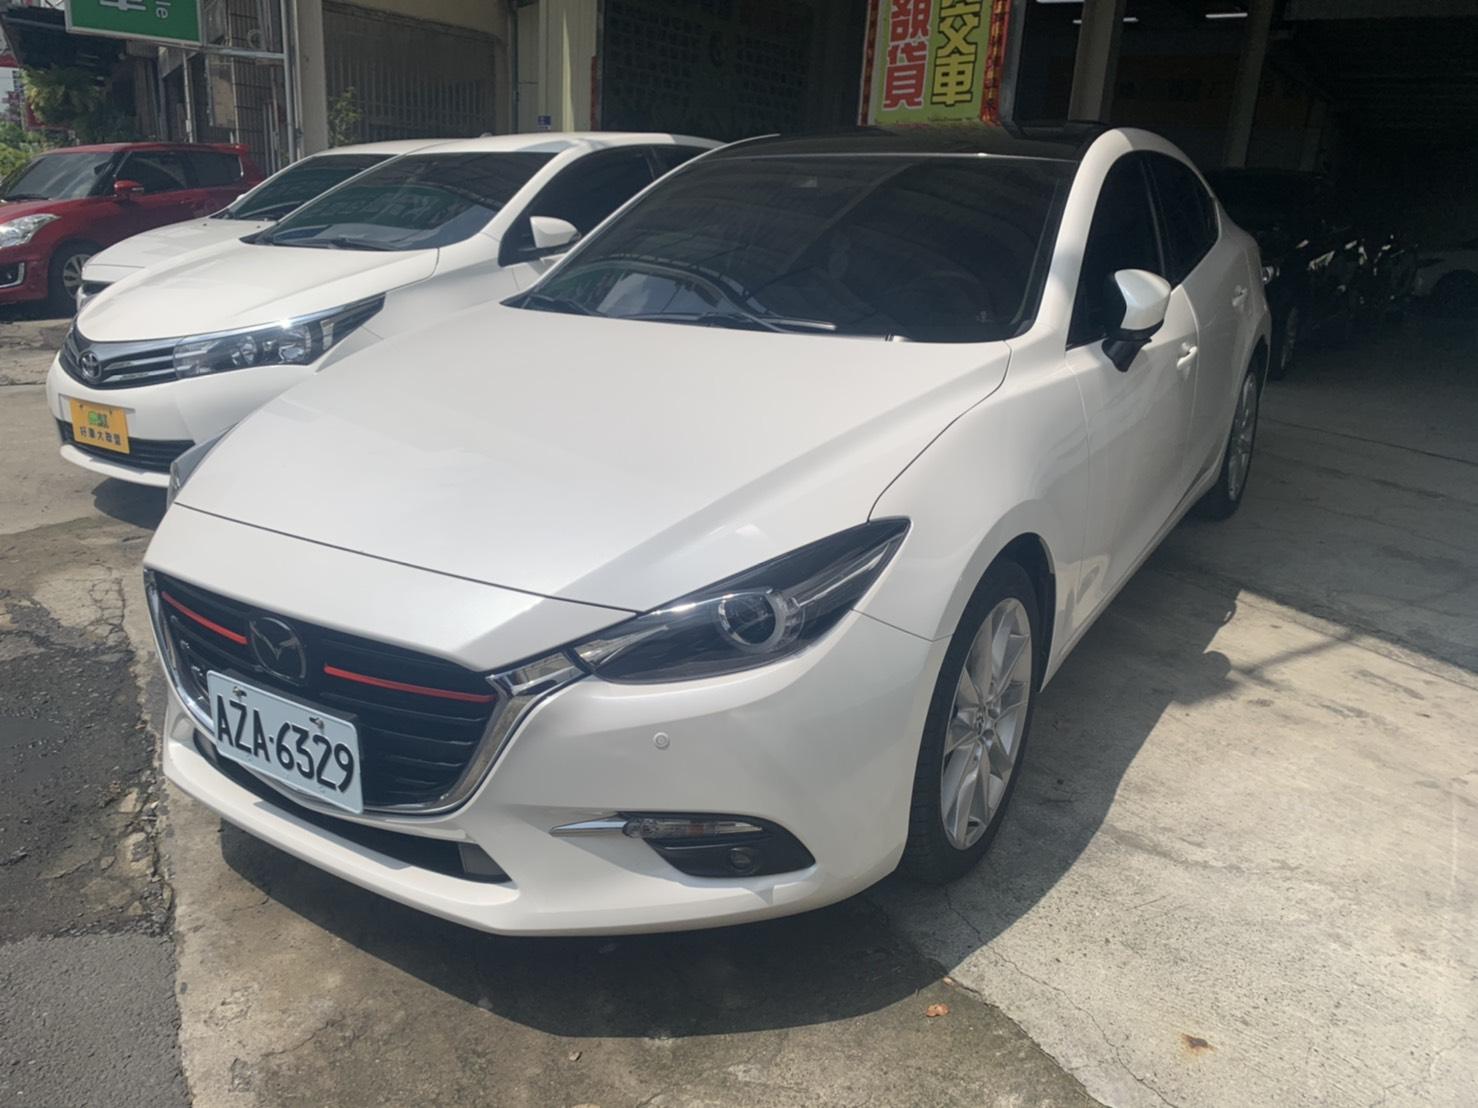 2018 Mazda 馬自達 3